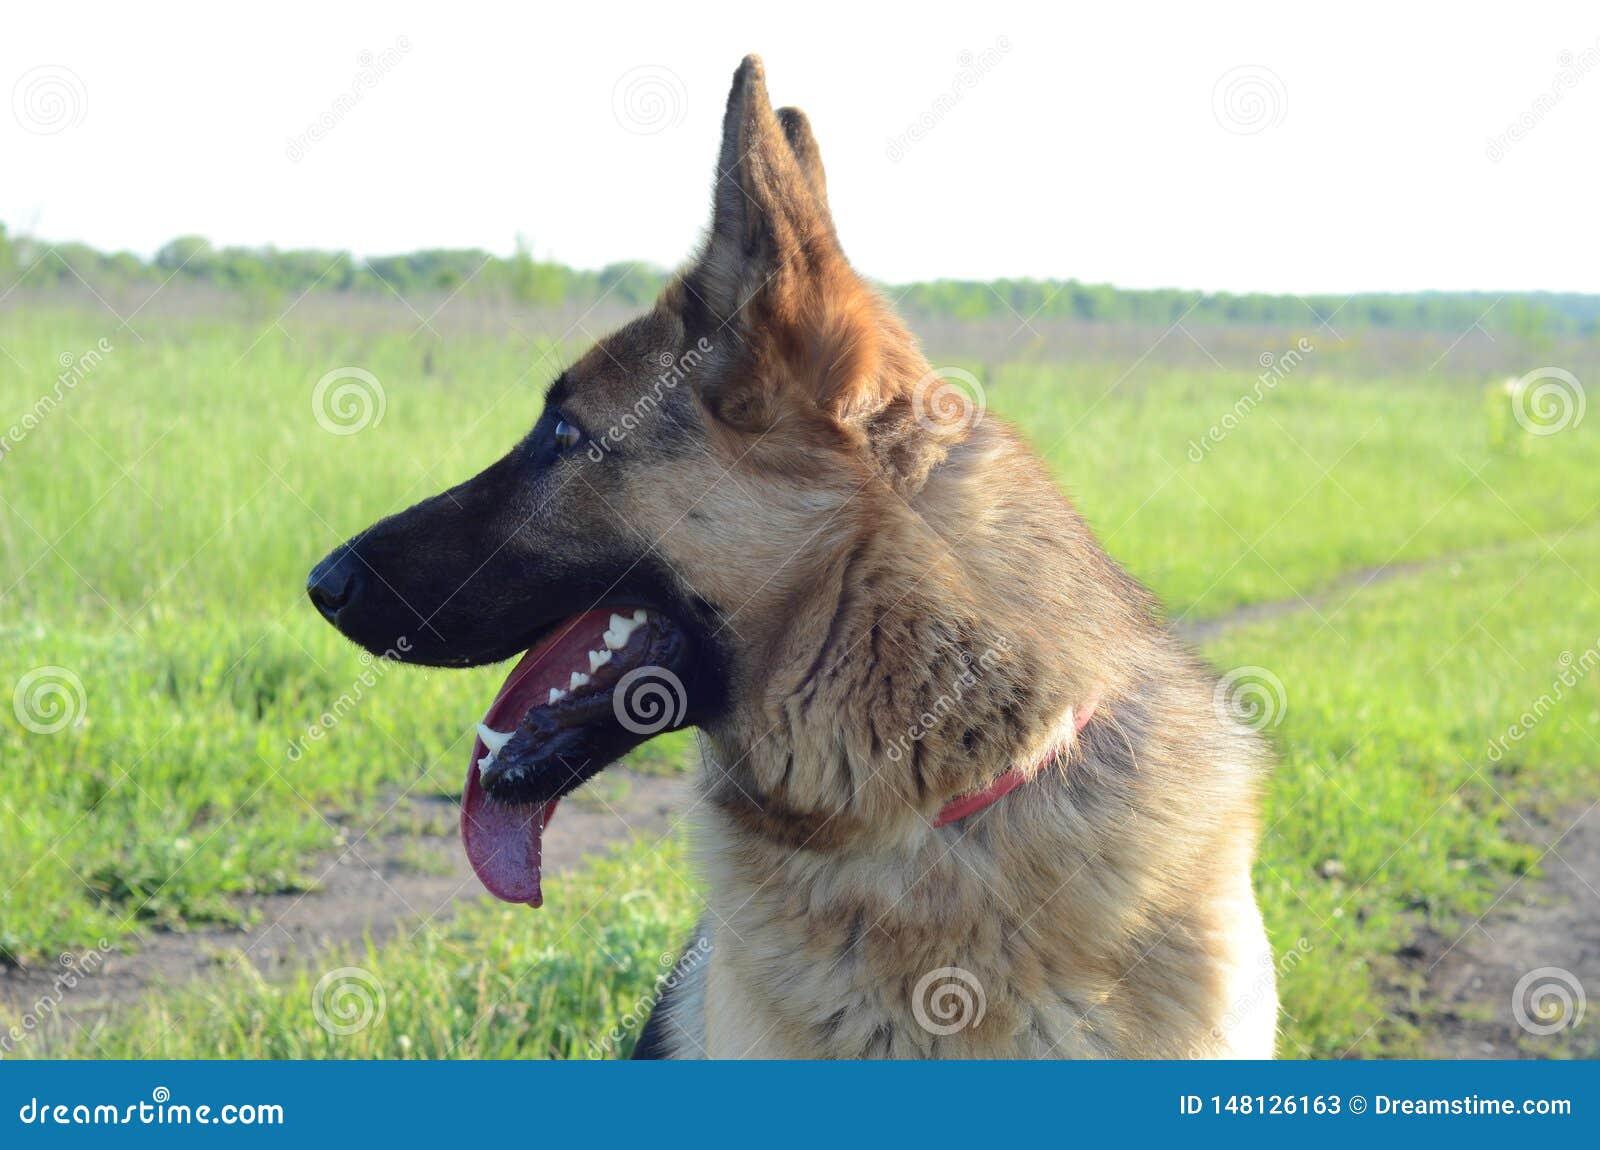 German shepherd stands in the field